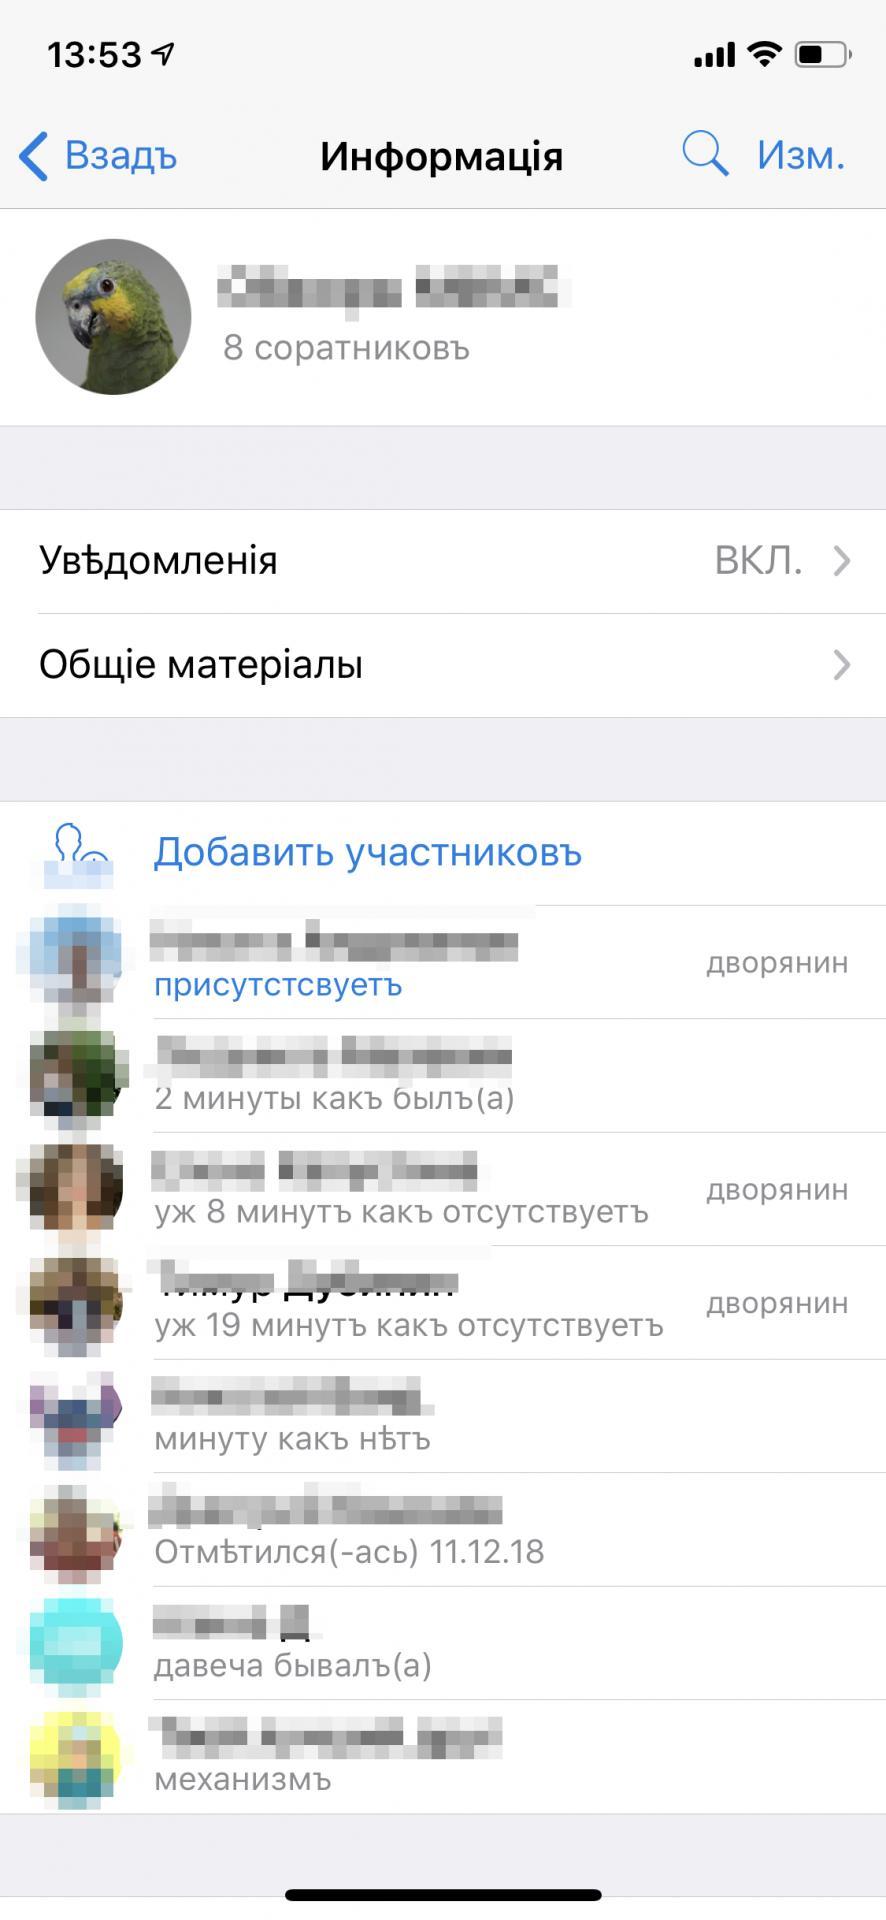 Дореволюцiонный Телеграмъ